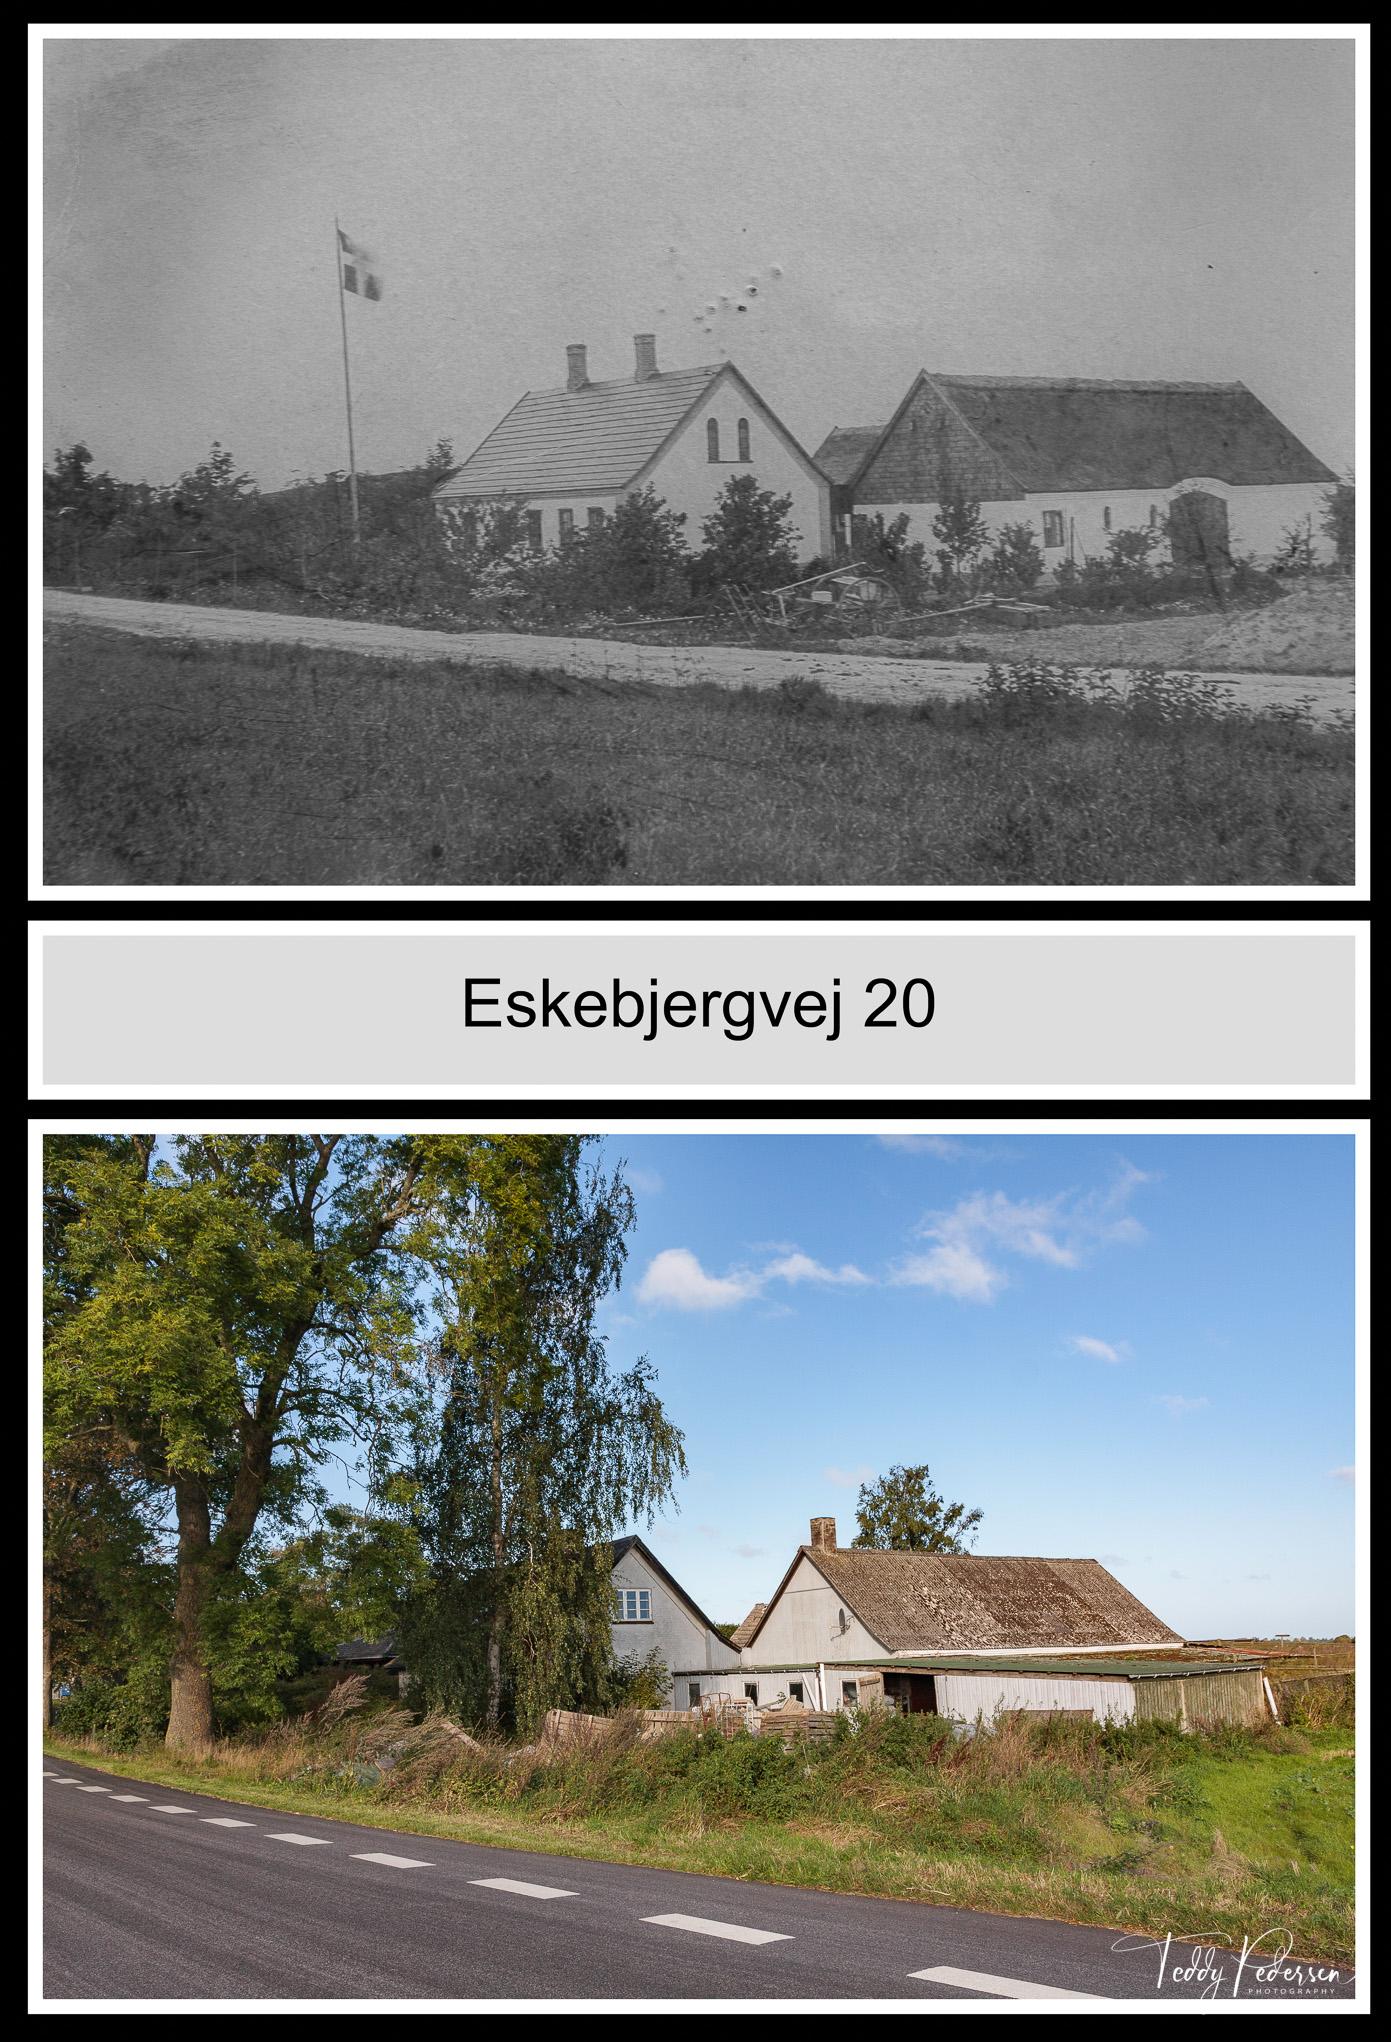 001-005-Eskebjergvej-Fasanfarmen_HighRes_LowRes